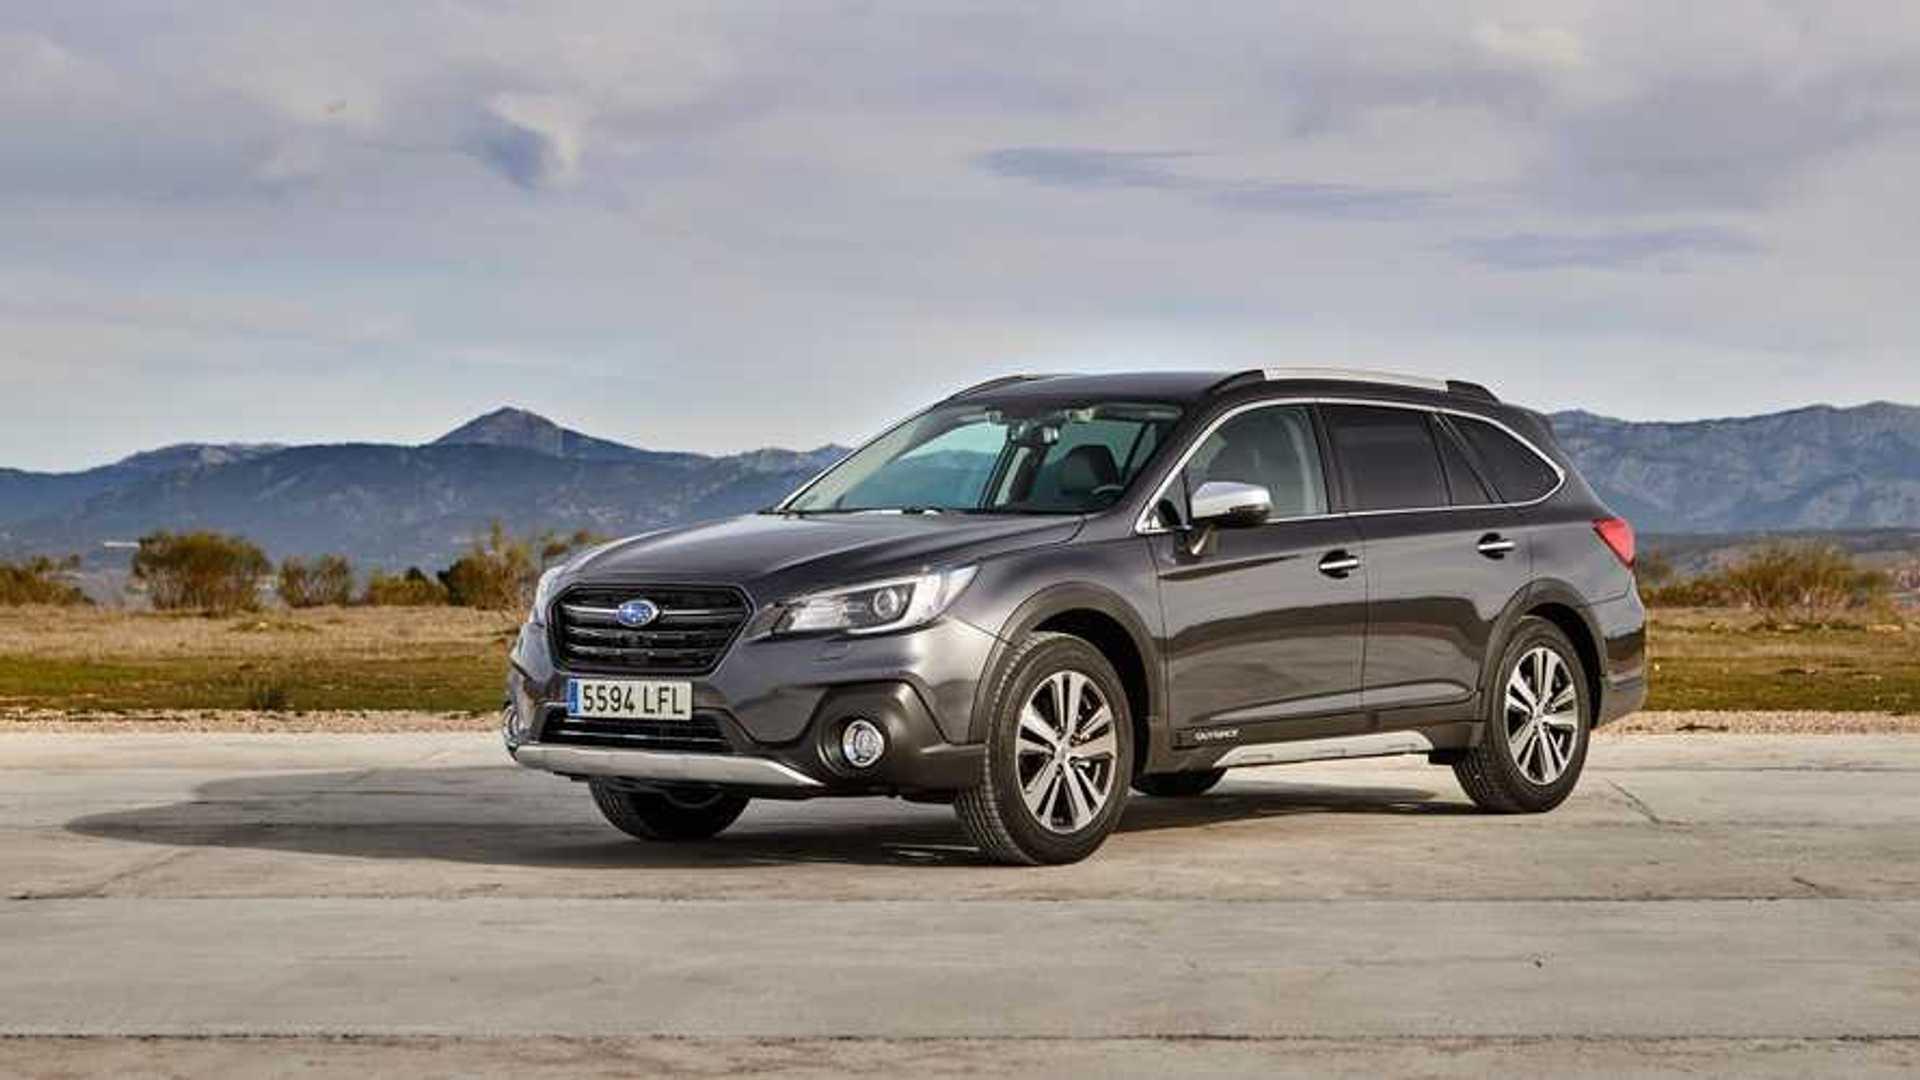 2020 Subaru Outback Turbo Hybrid Research New